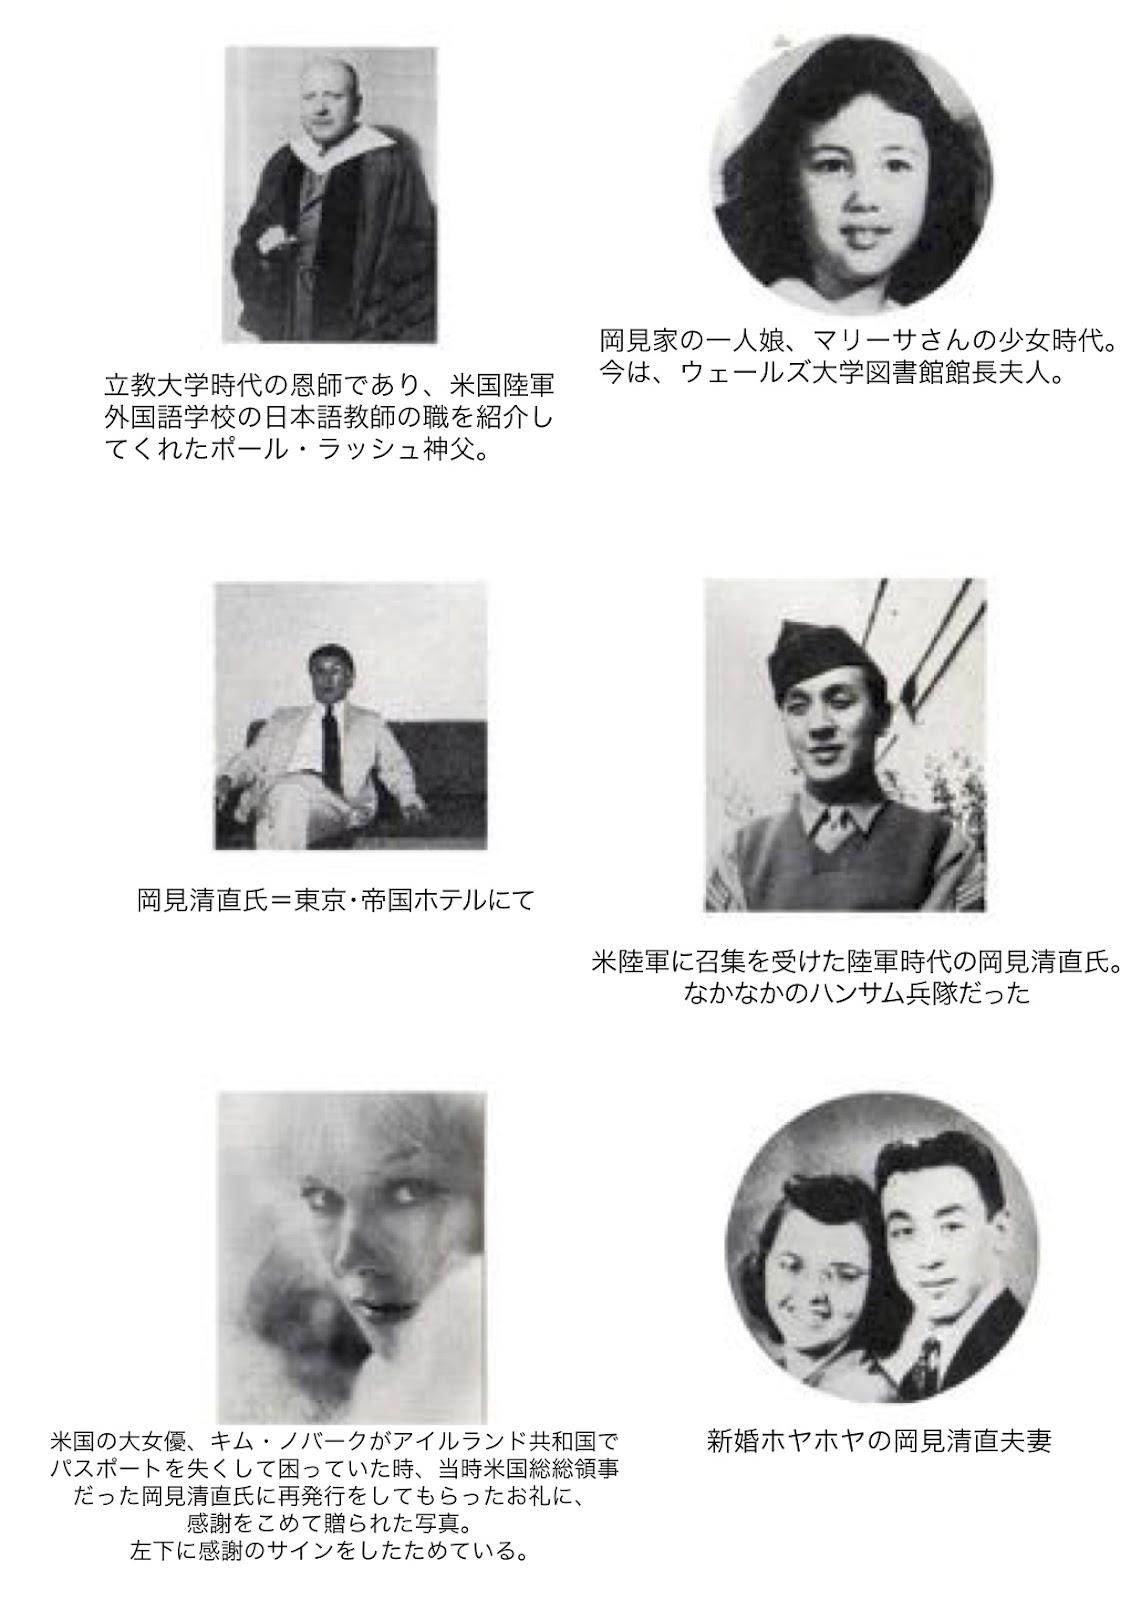 04_photo.jpg